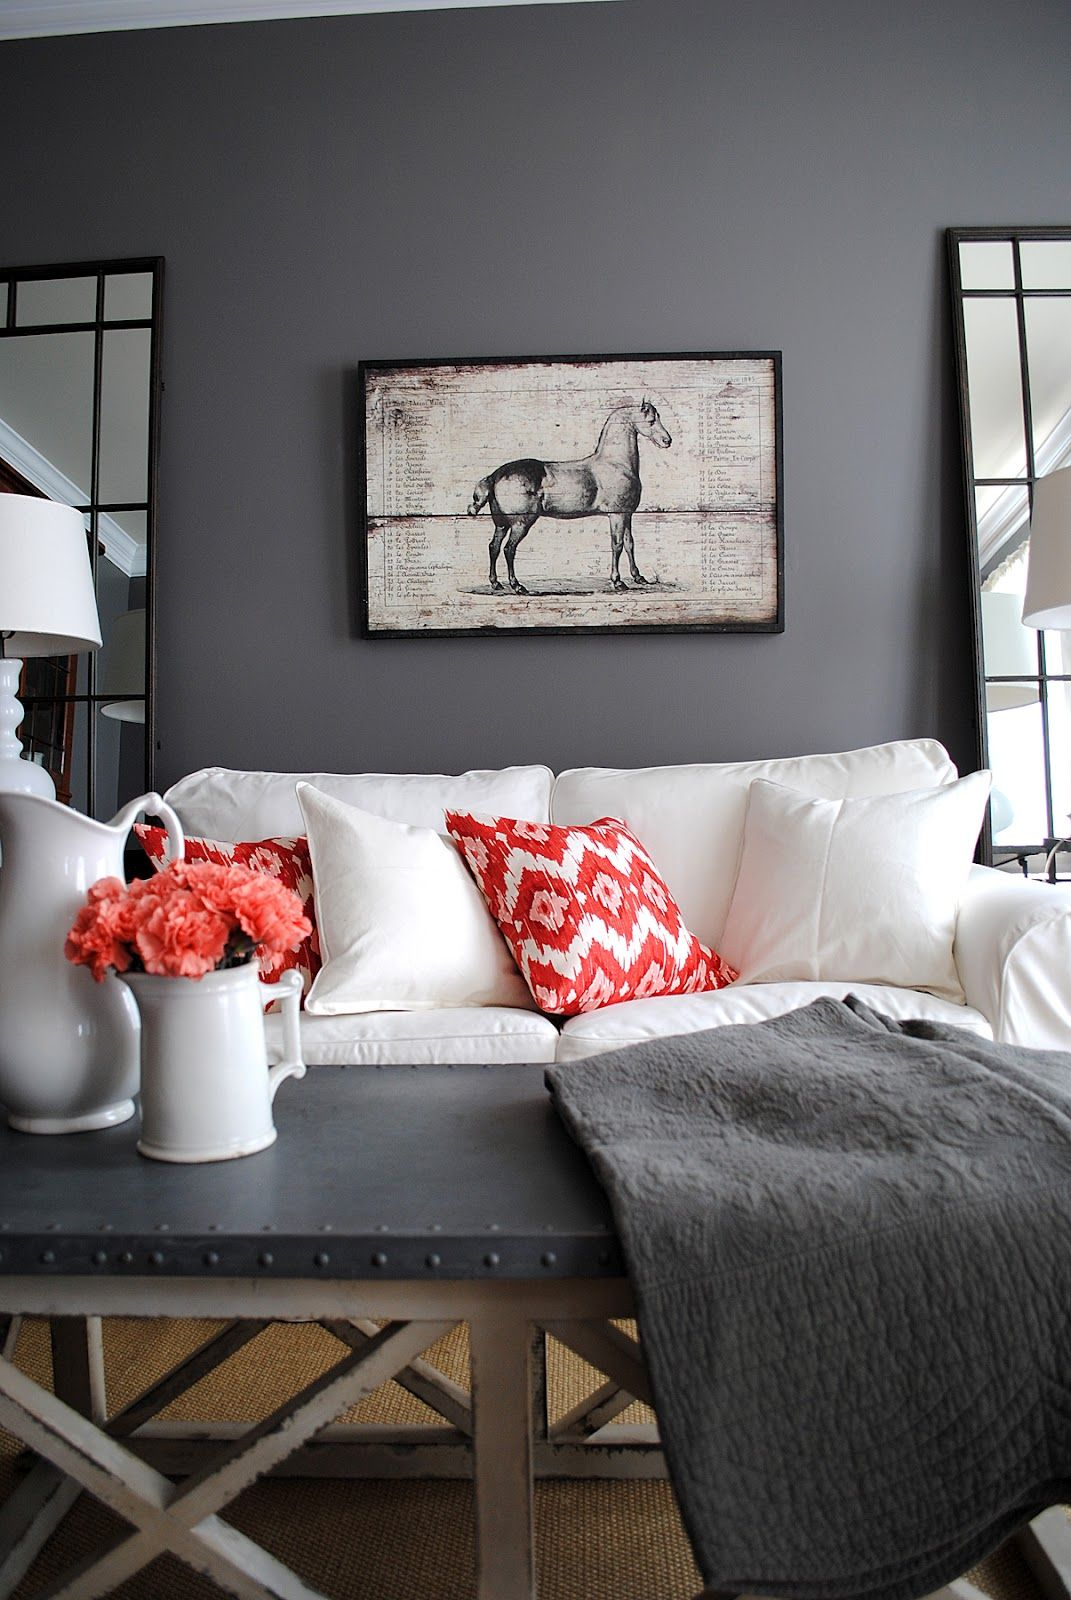 Our House - The Living Room | Lebensfreude und Wohnzimmer